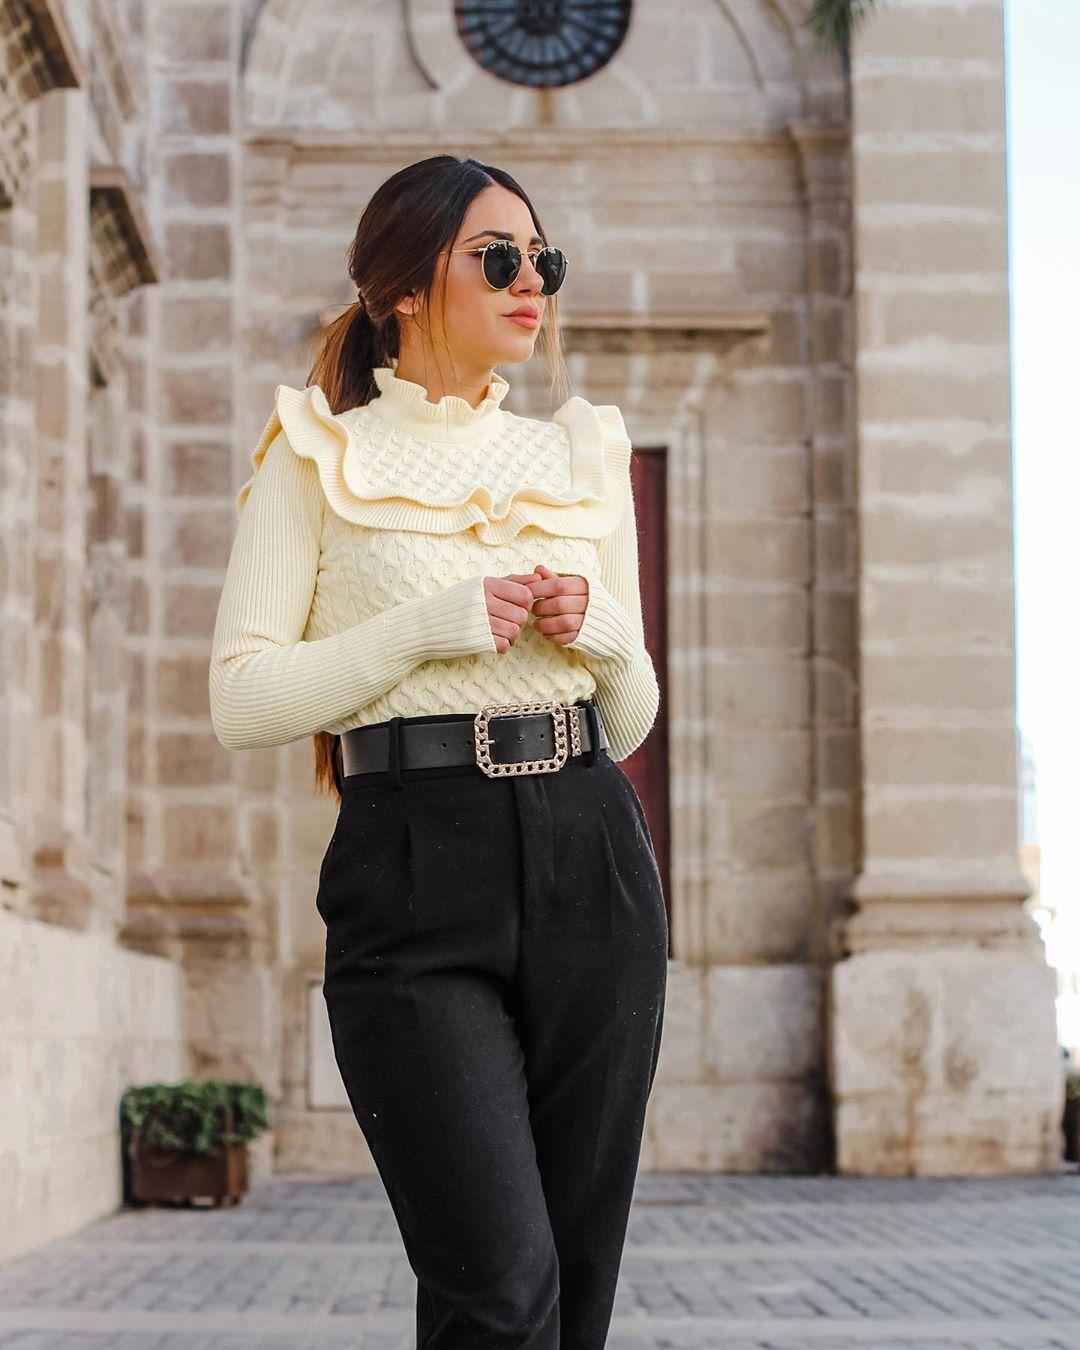 sweater with twists and ruffles de Zara sur maricarmencarrionmateo